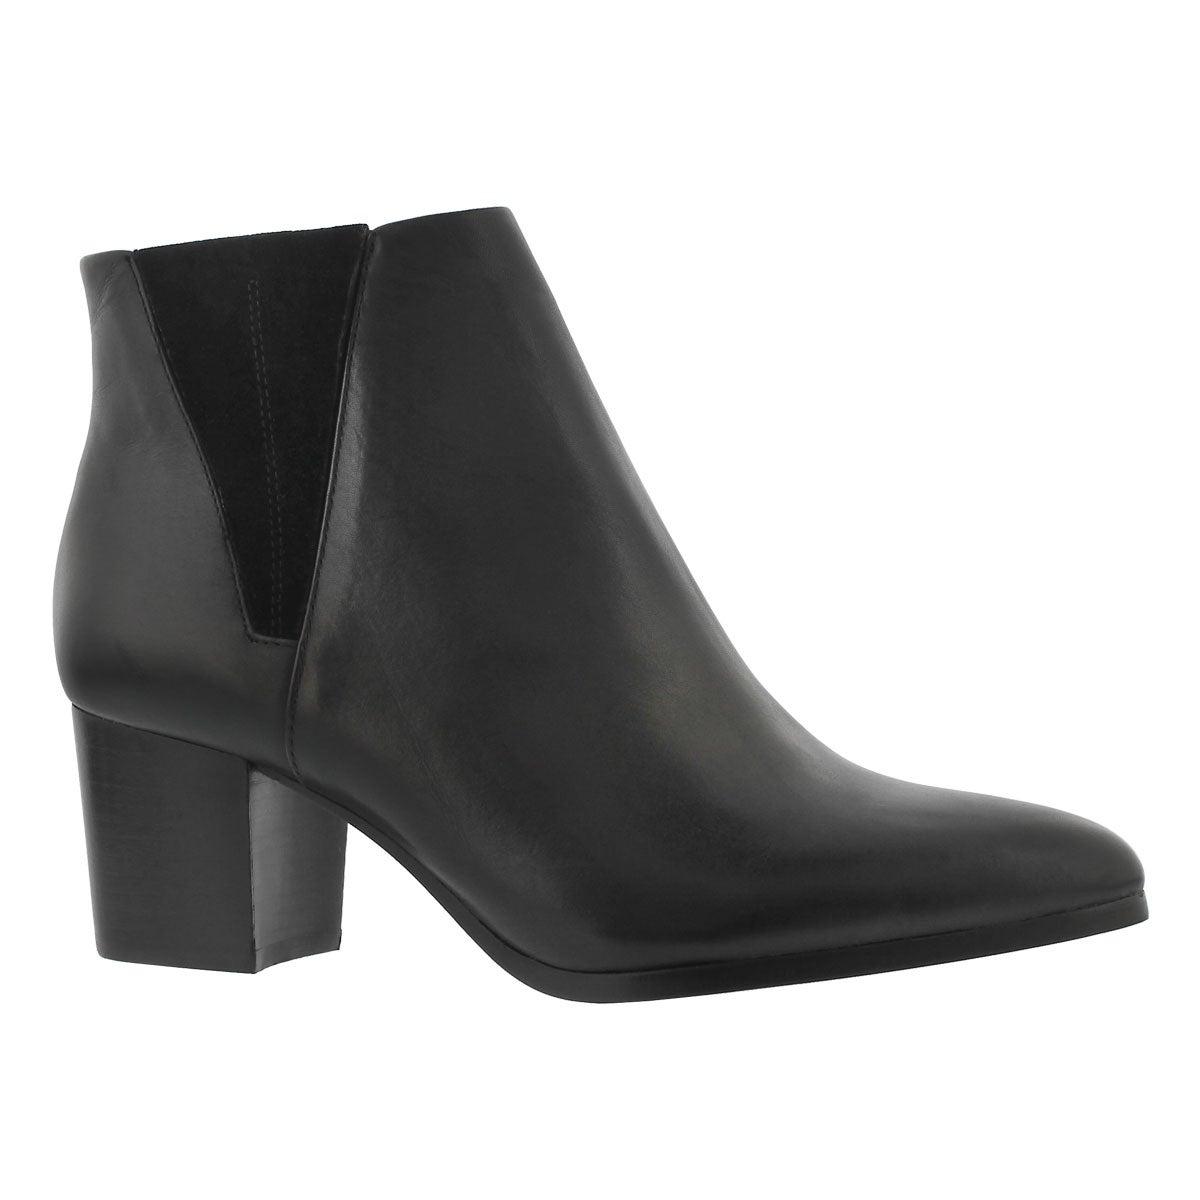 Women's BRISSA black dress booties